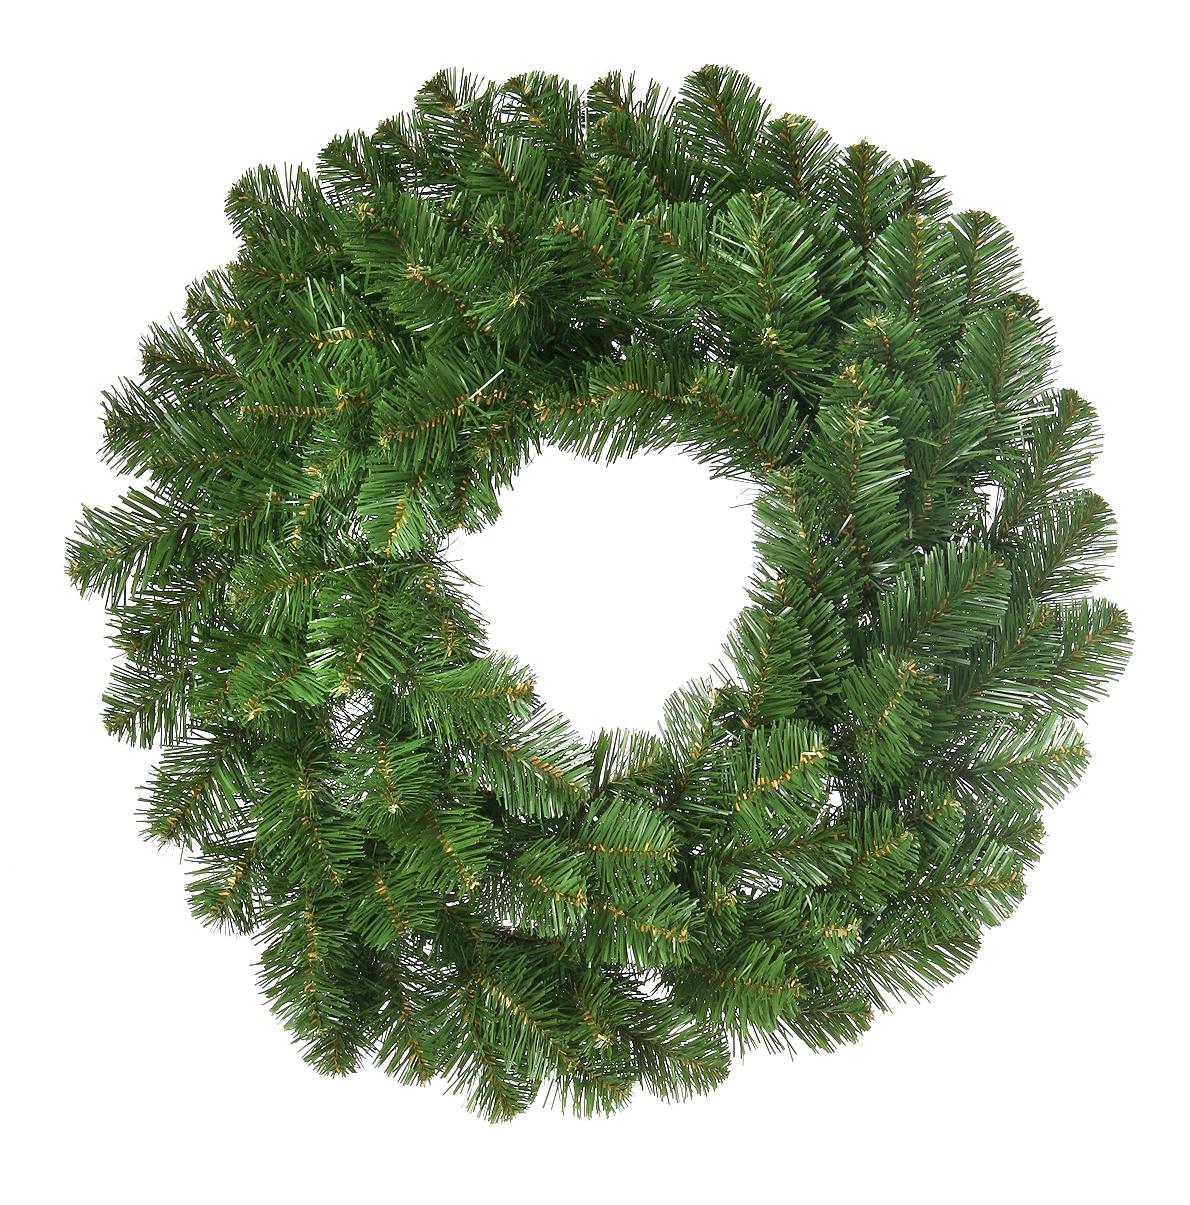 CHRISTMAS WREATHS, SWAGS & TEARDROPS